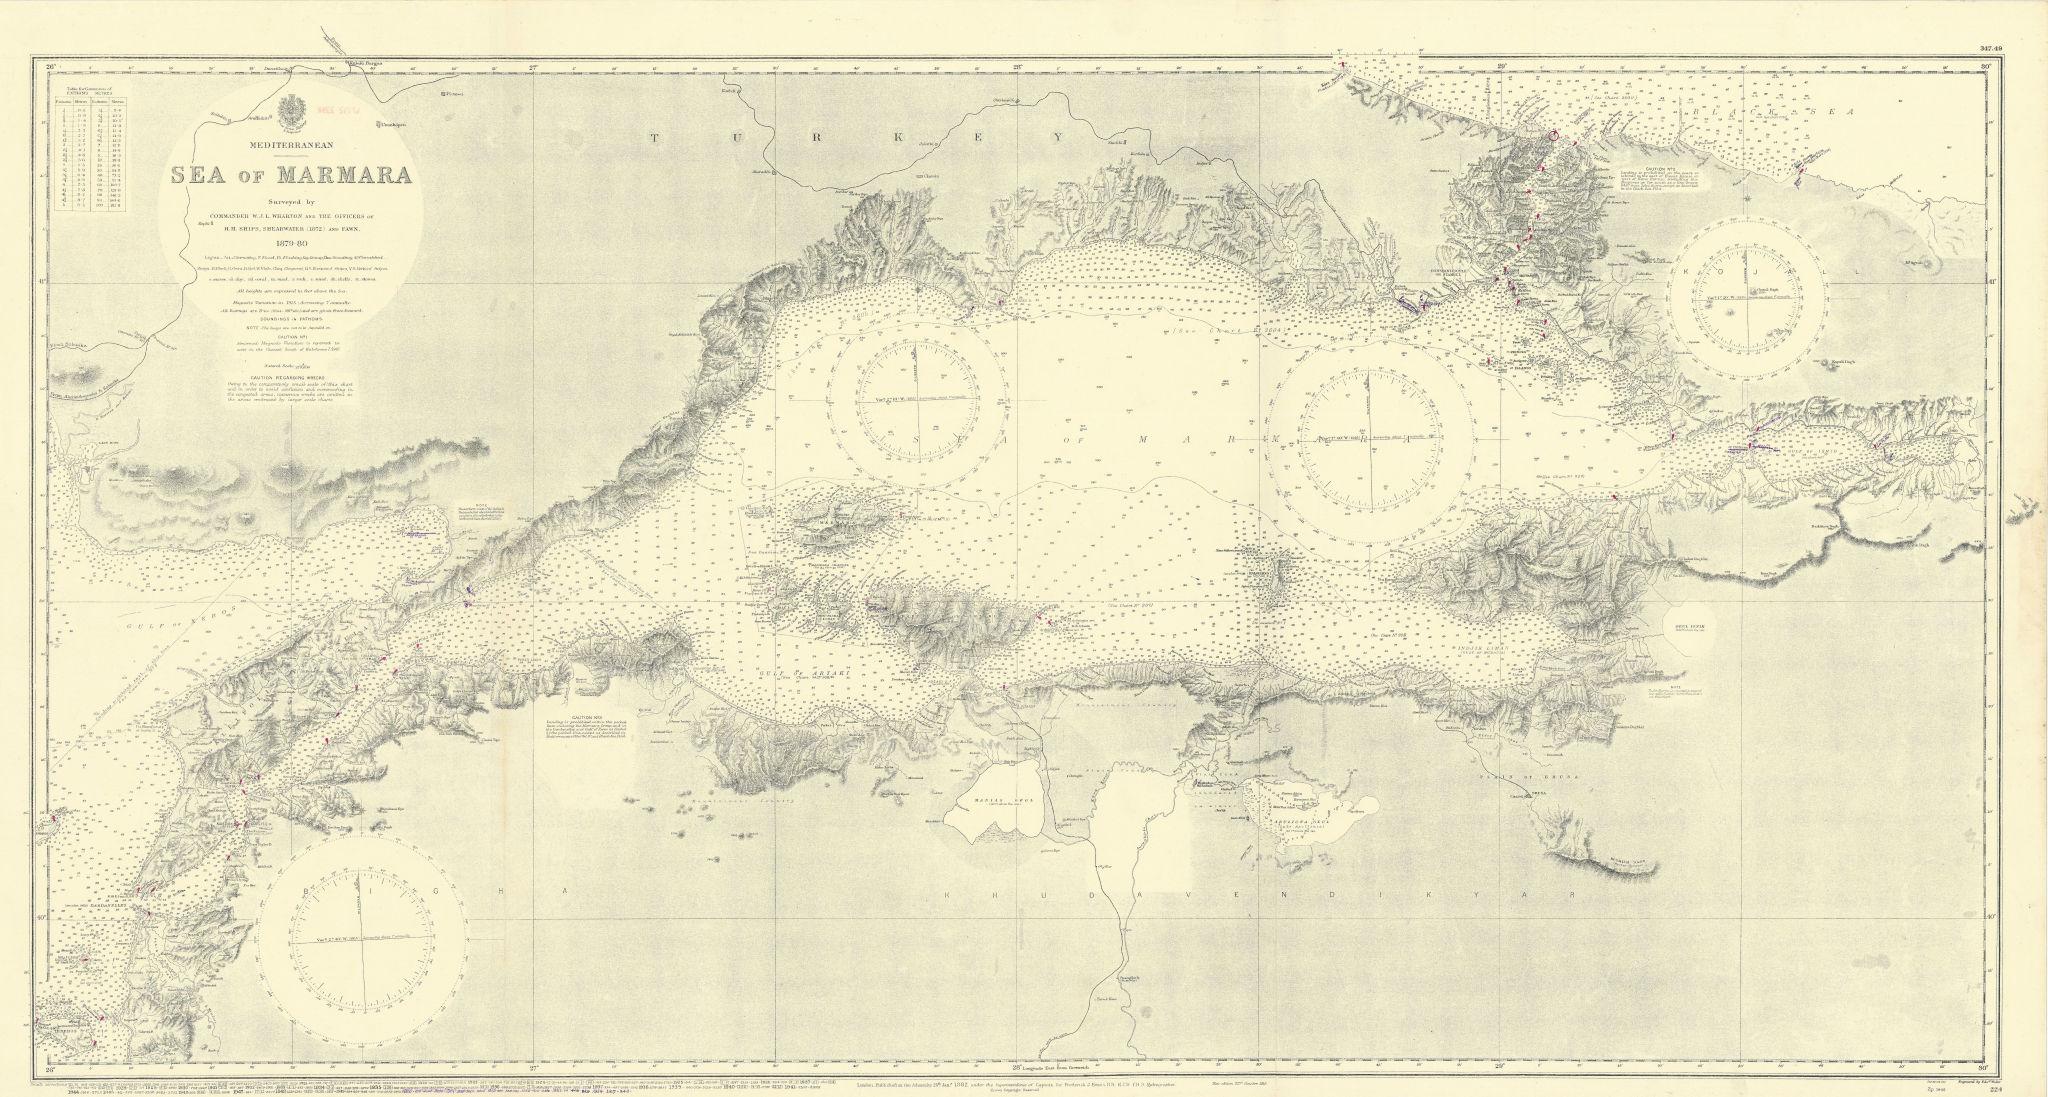 Sea of Marmara. Turkey Istanbul Dardanelles. ADMIRALTY sea chart 1882 (1954) map